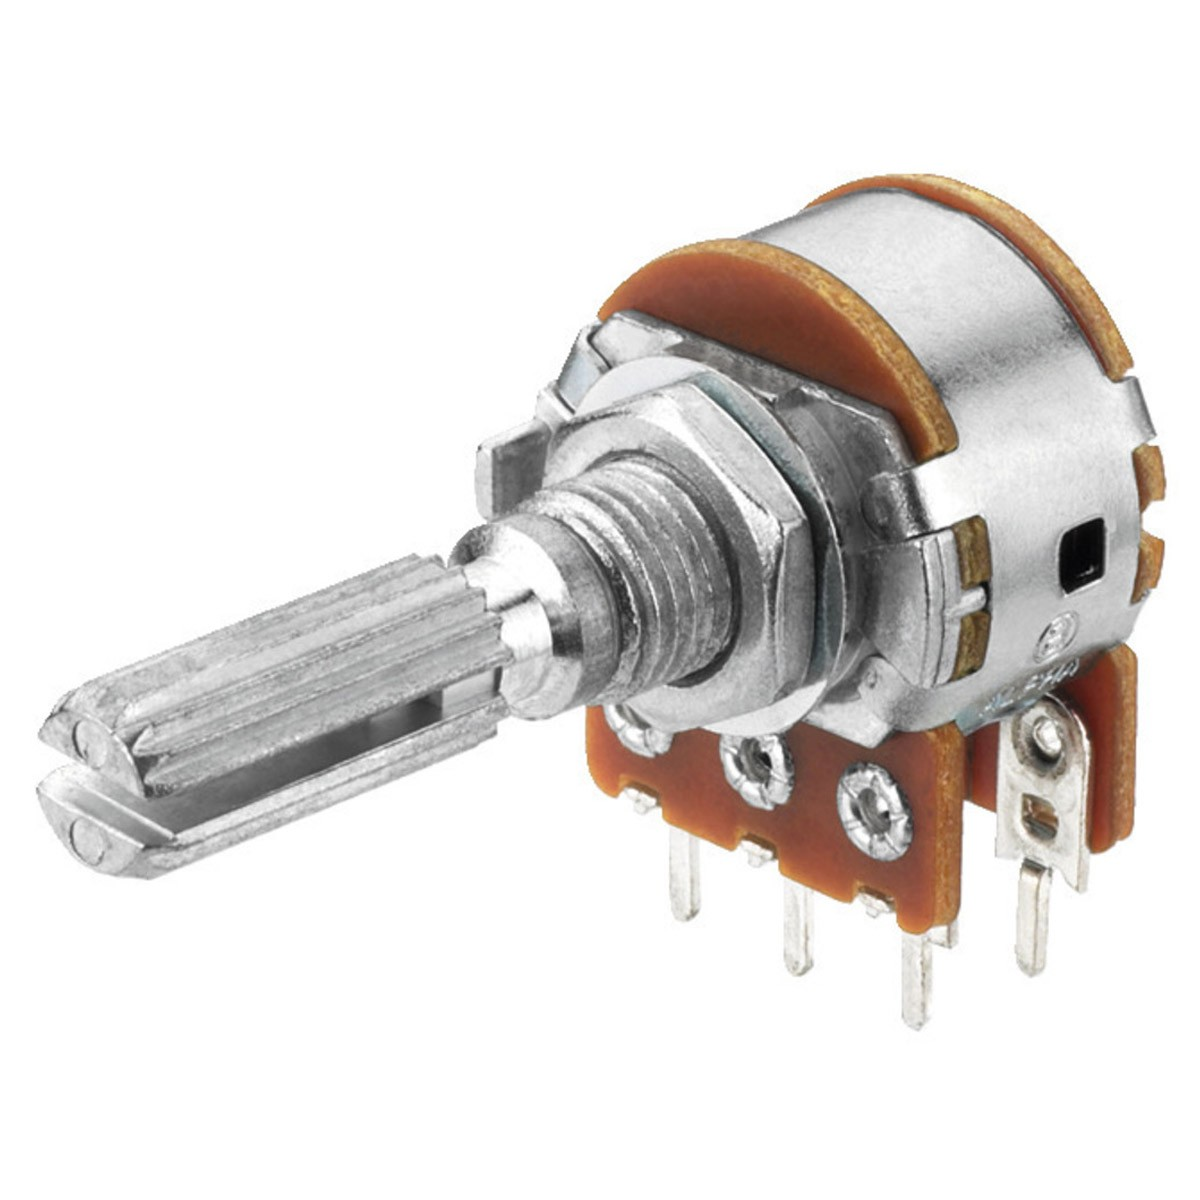 Stereo potentiometer VRB-101S100 100k ohm center point